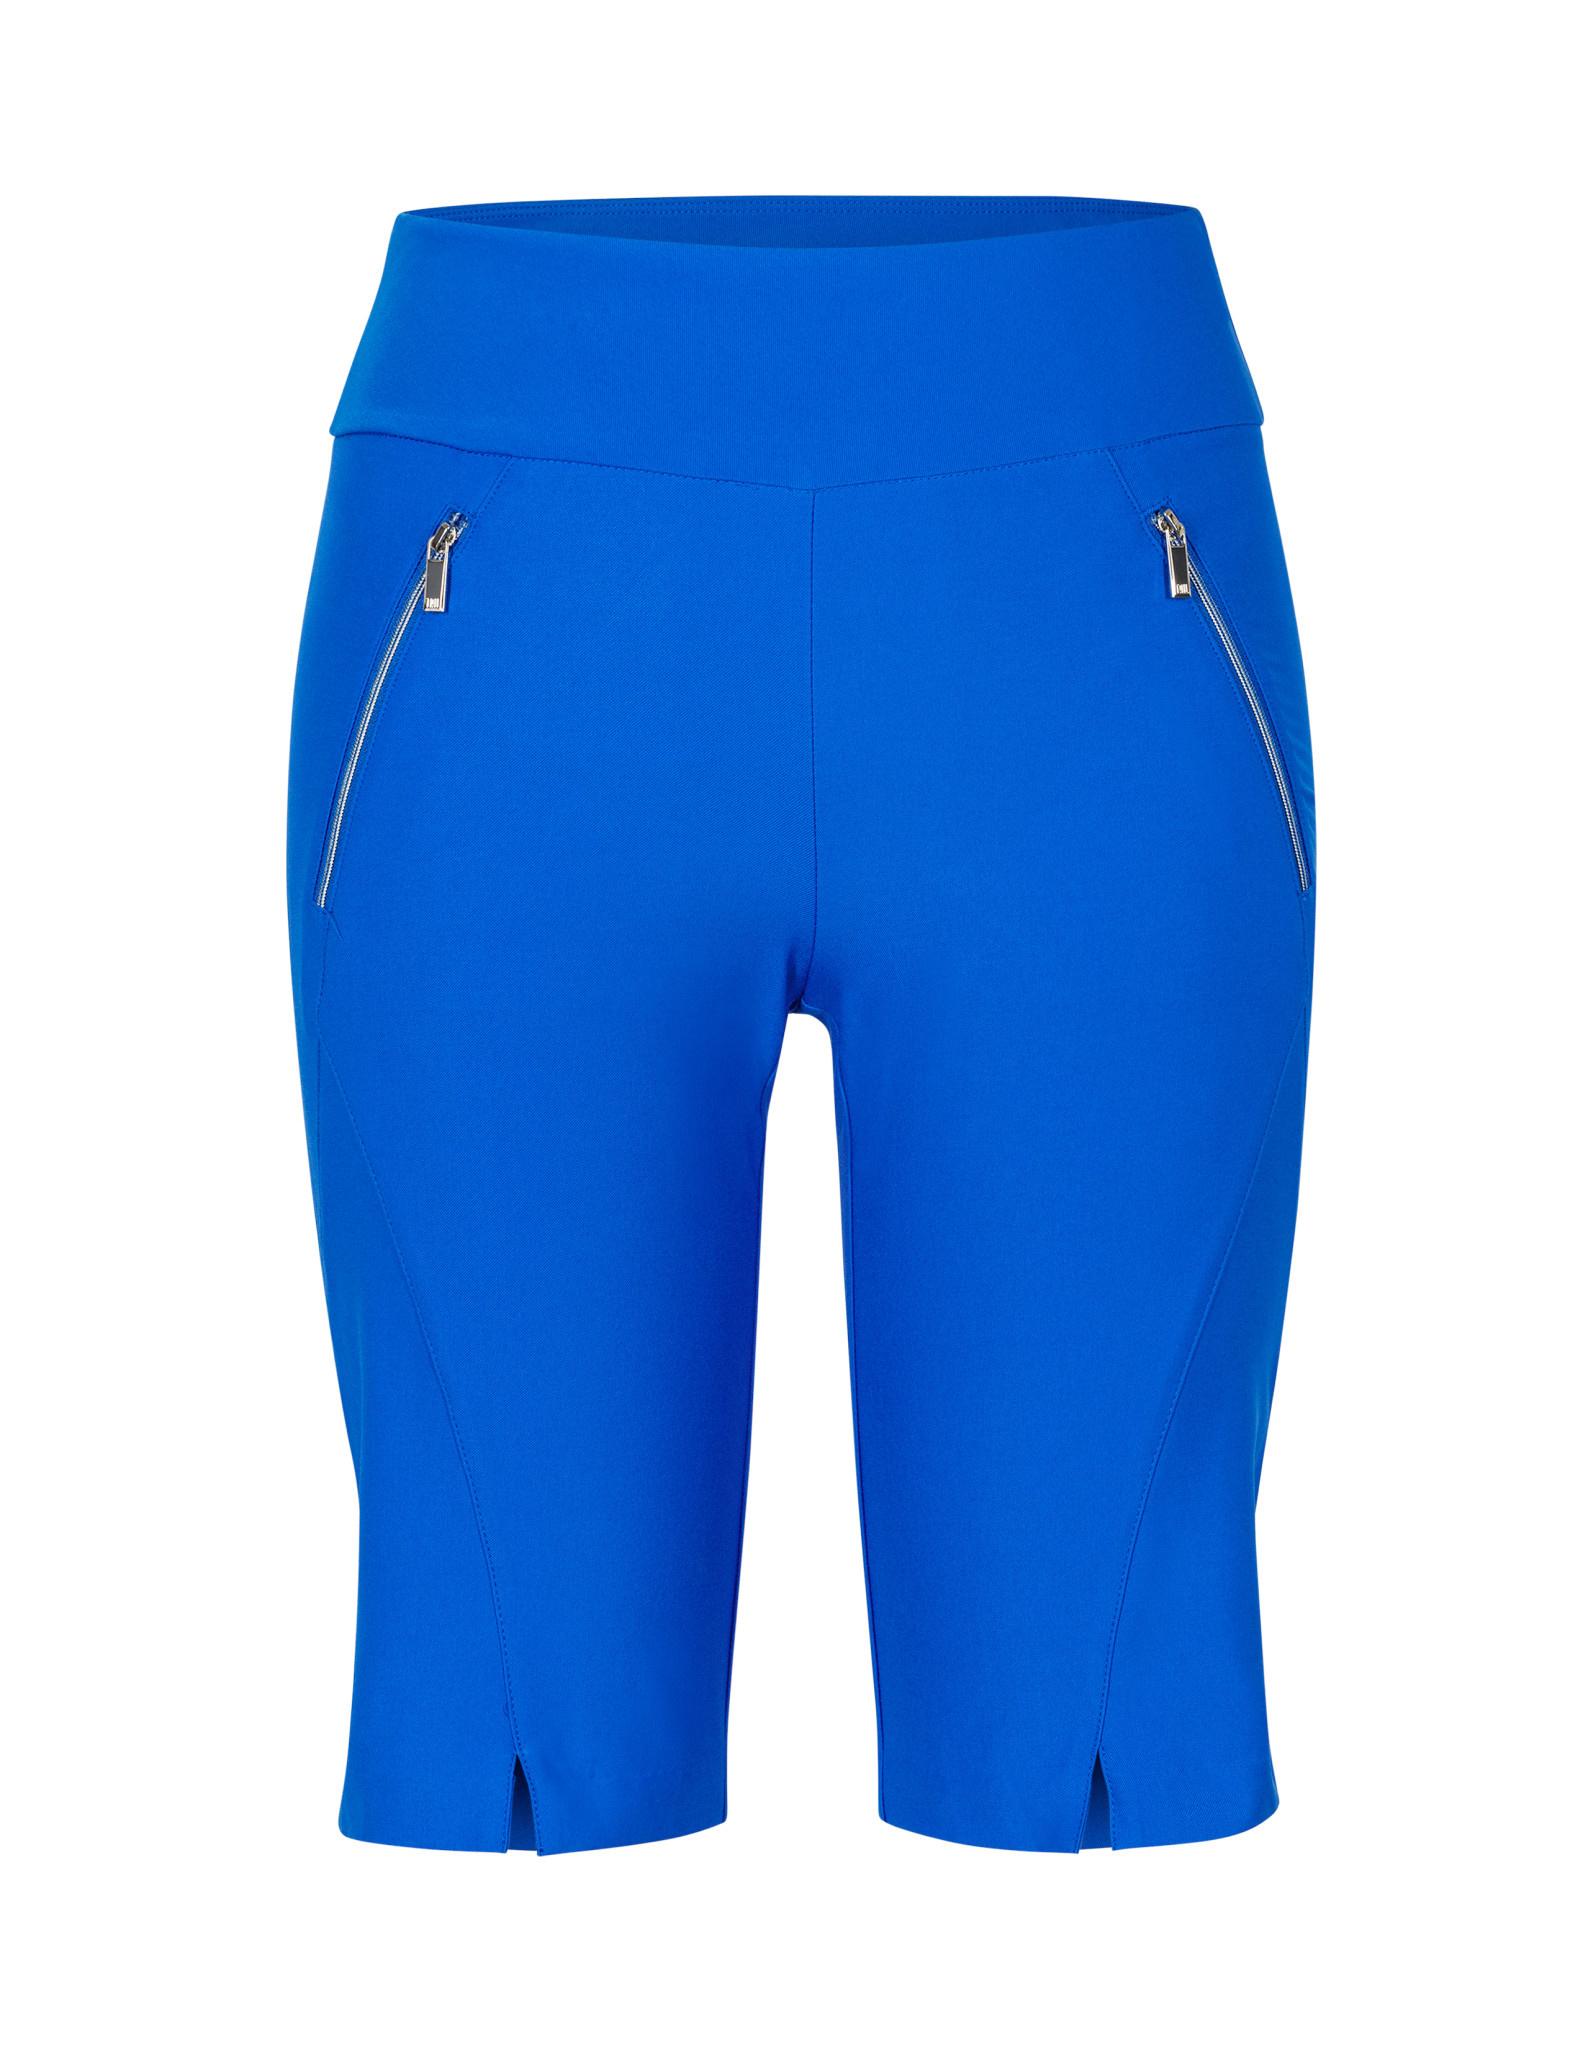 Tail Tail Giuliana Short Admiral Blue